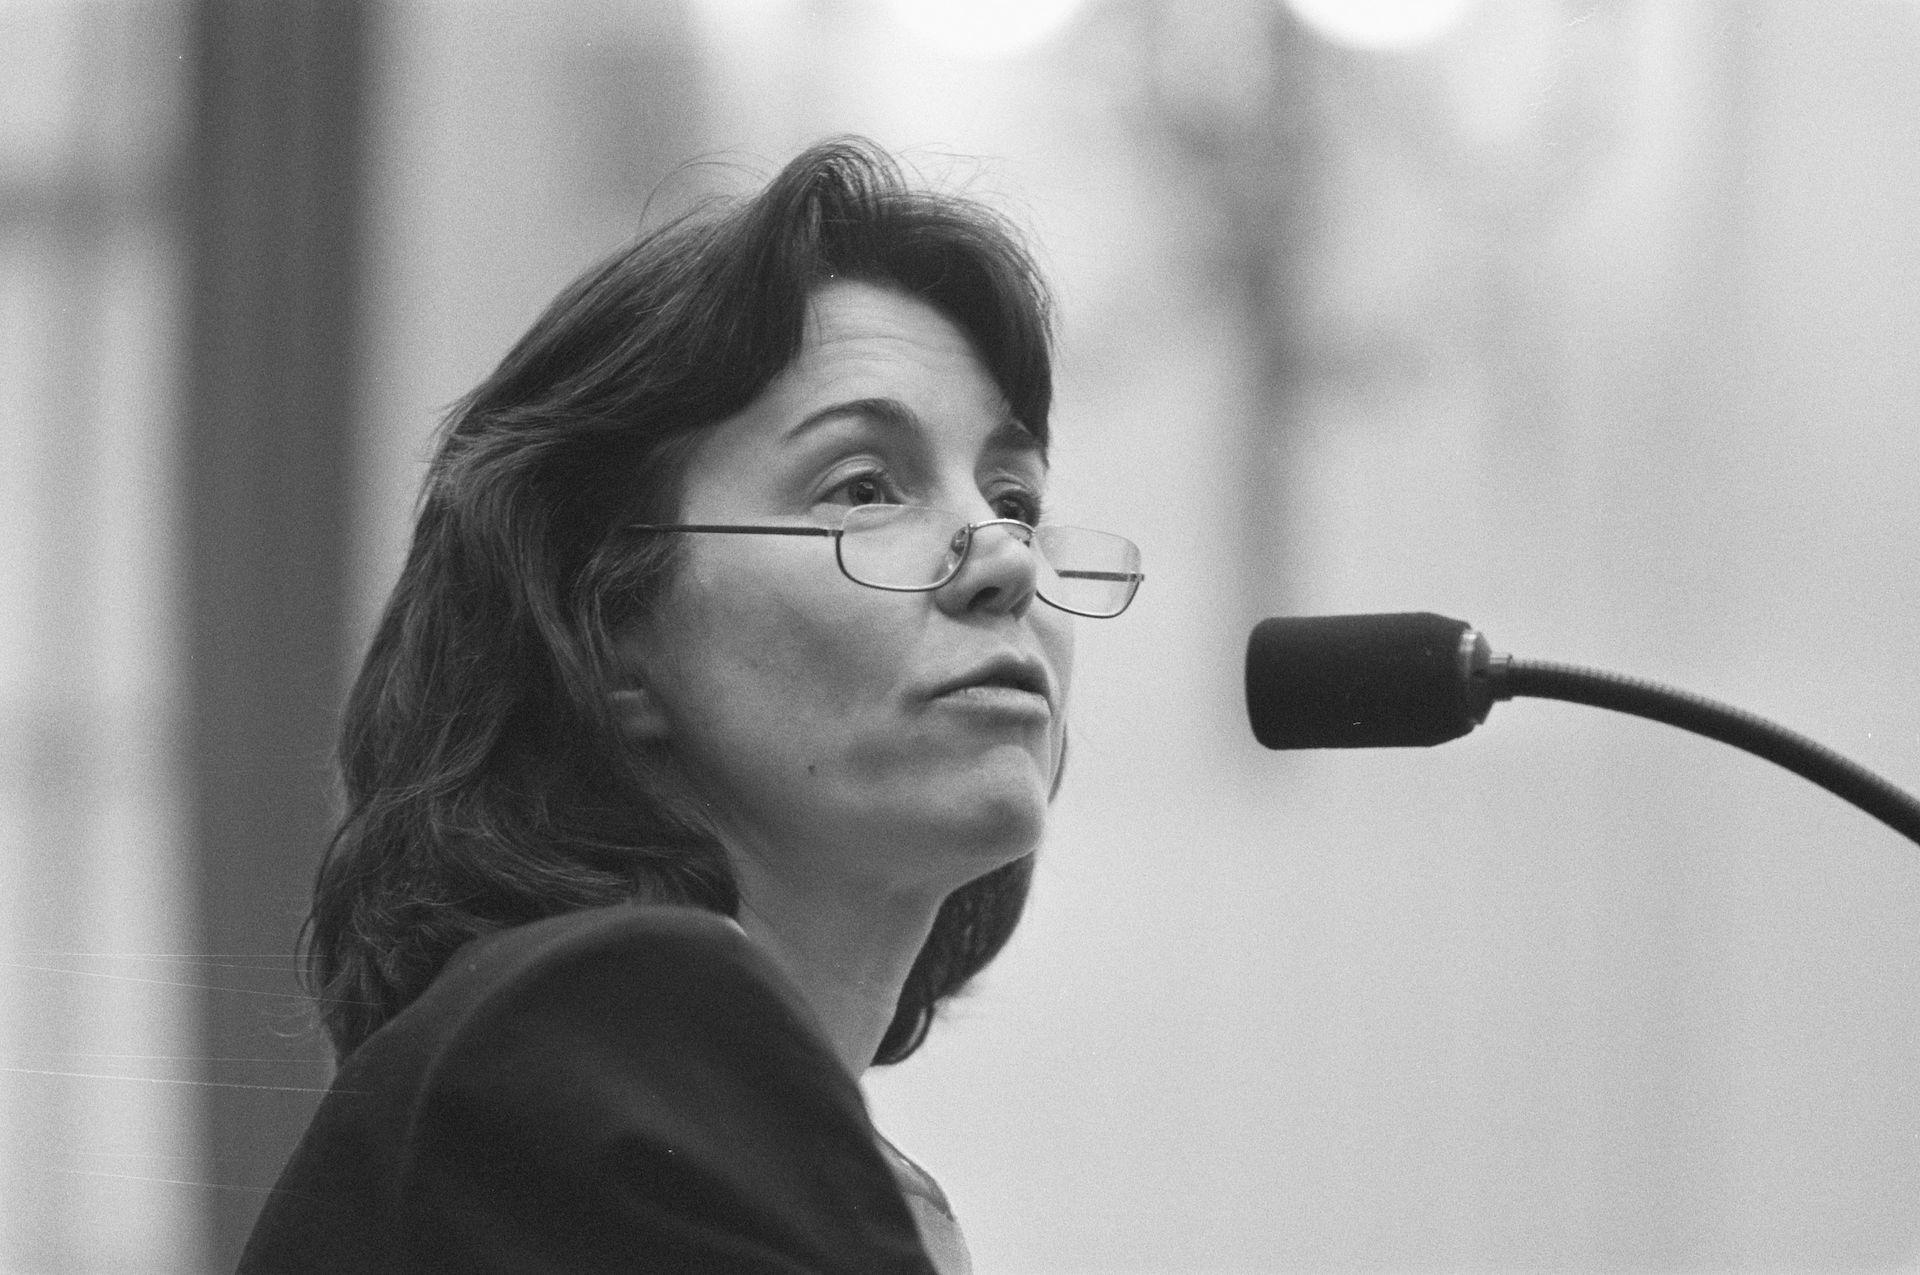 Photo of Tineke Netelenbos: Politician